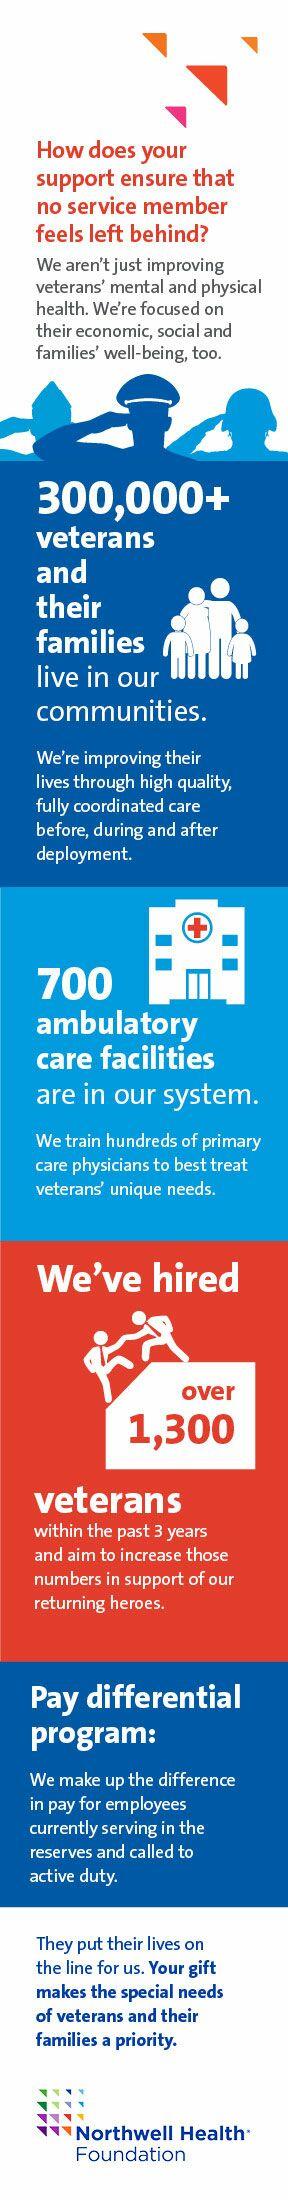 Veterans Services   Northwell Health Foundation